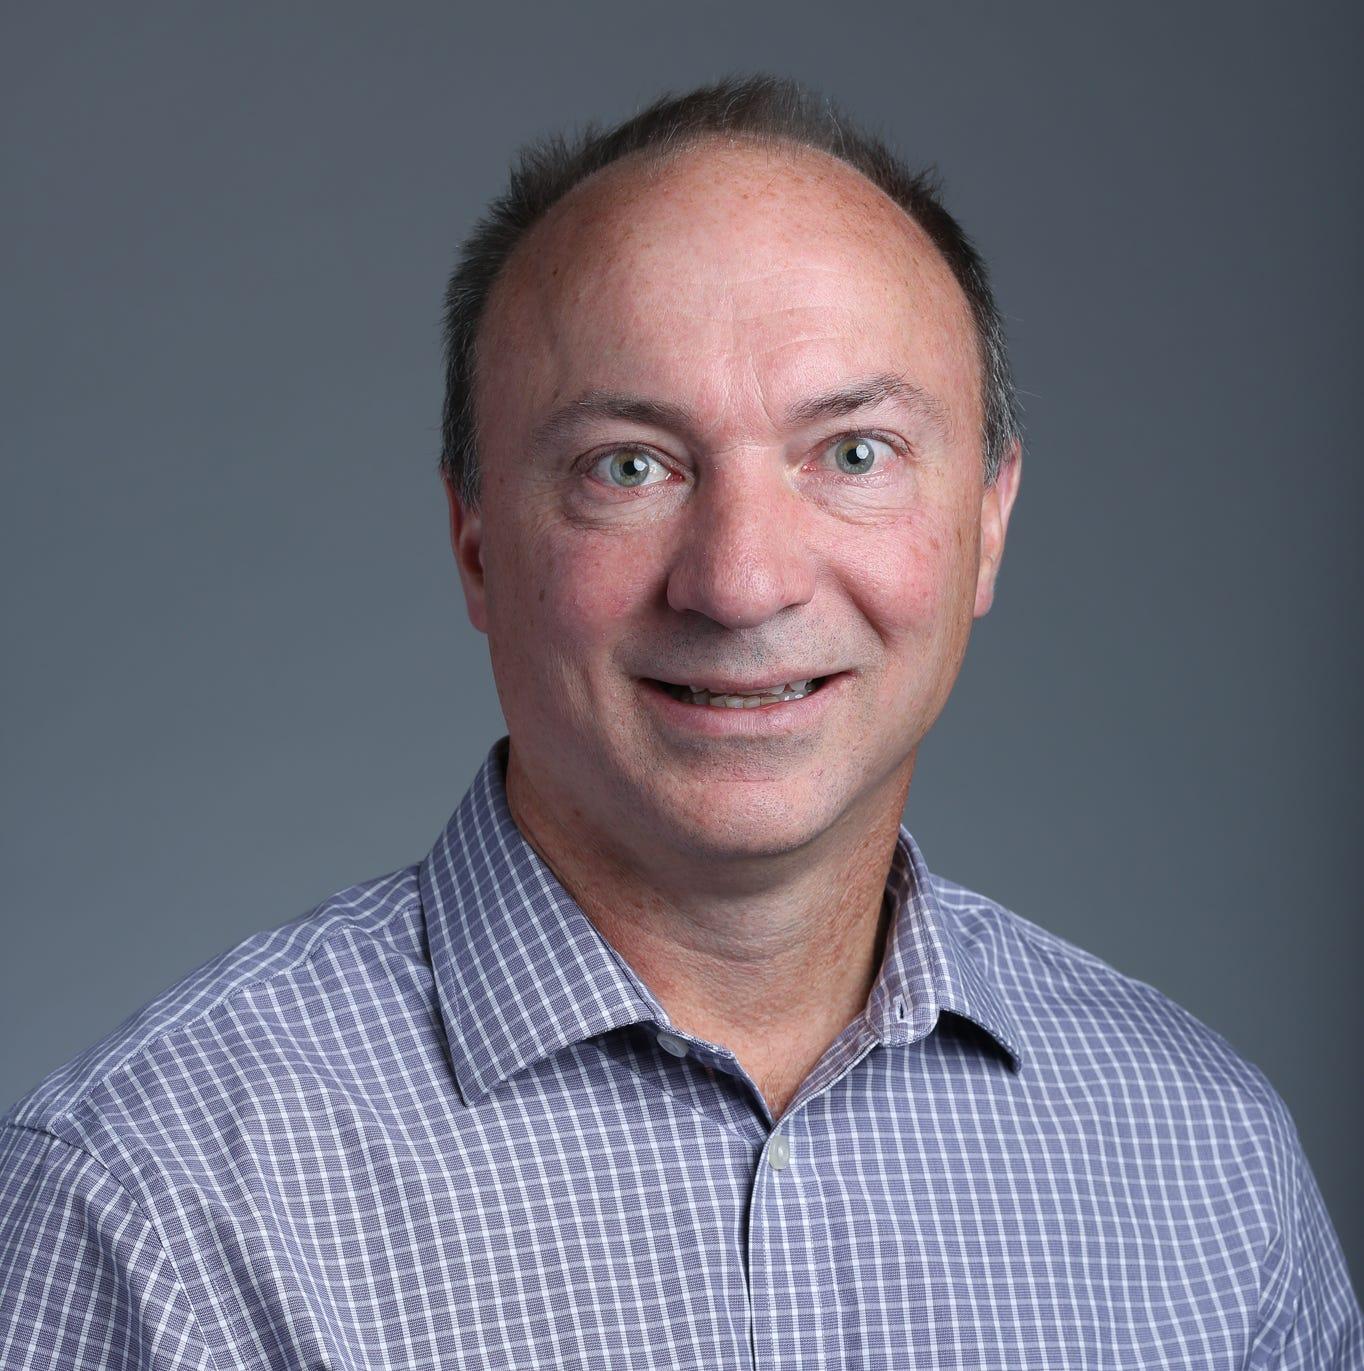 Mercury Marine names Chris Drees president, Pfeifer moves to Oshkosh Corporation